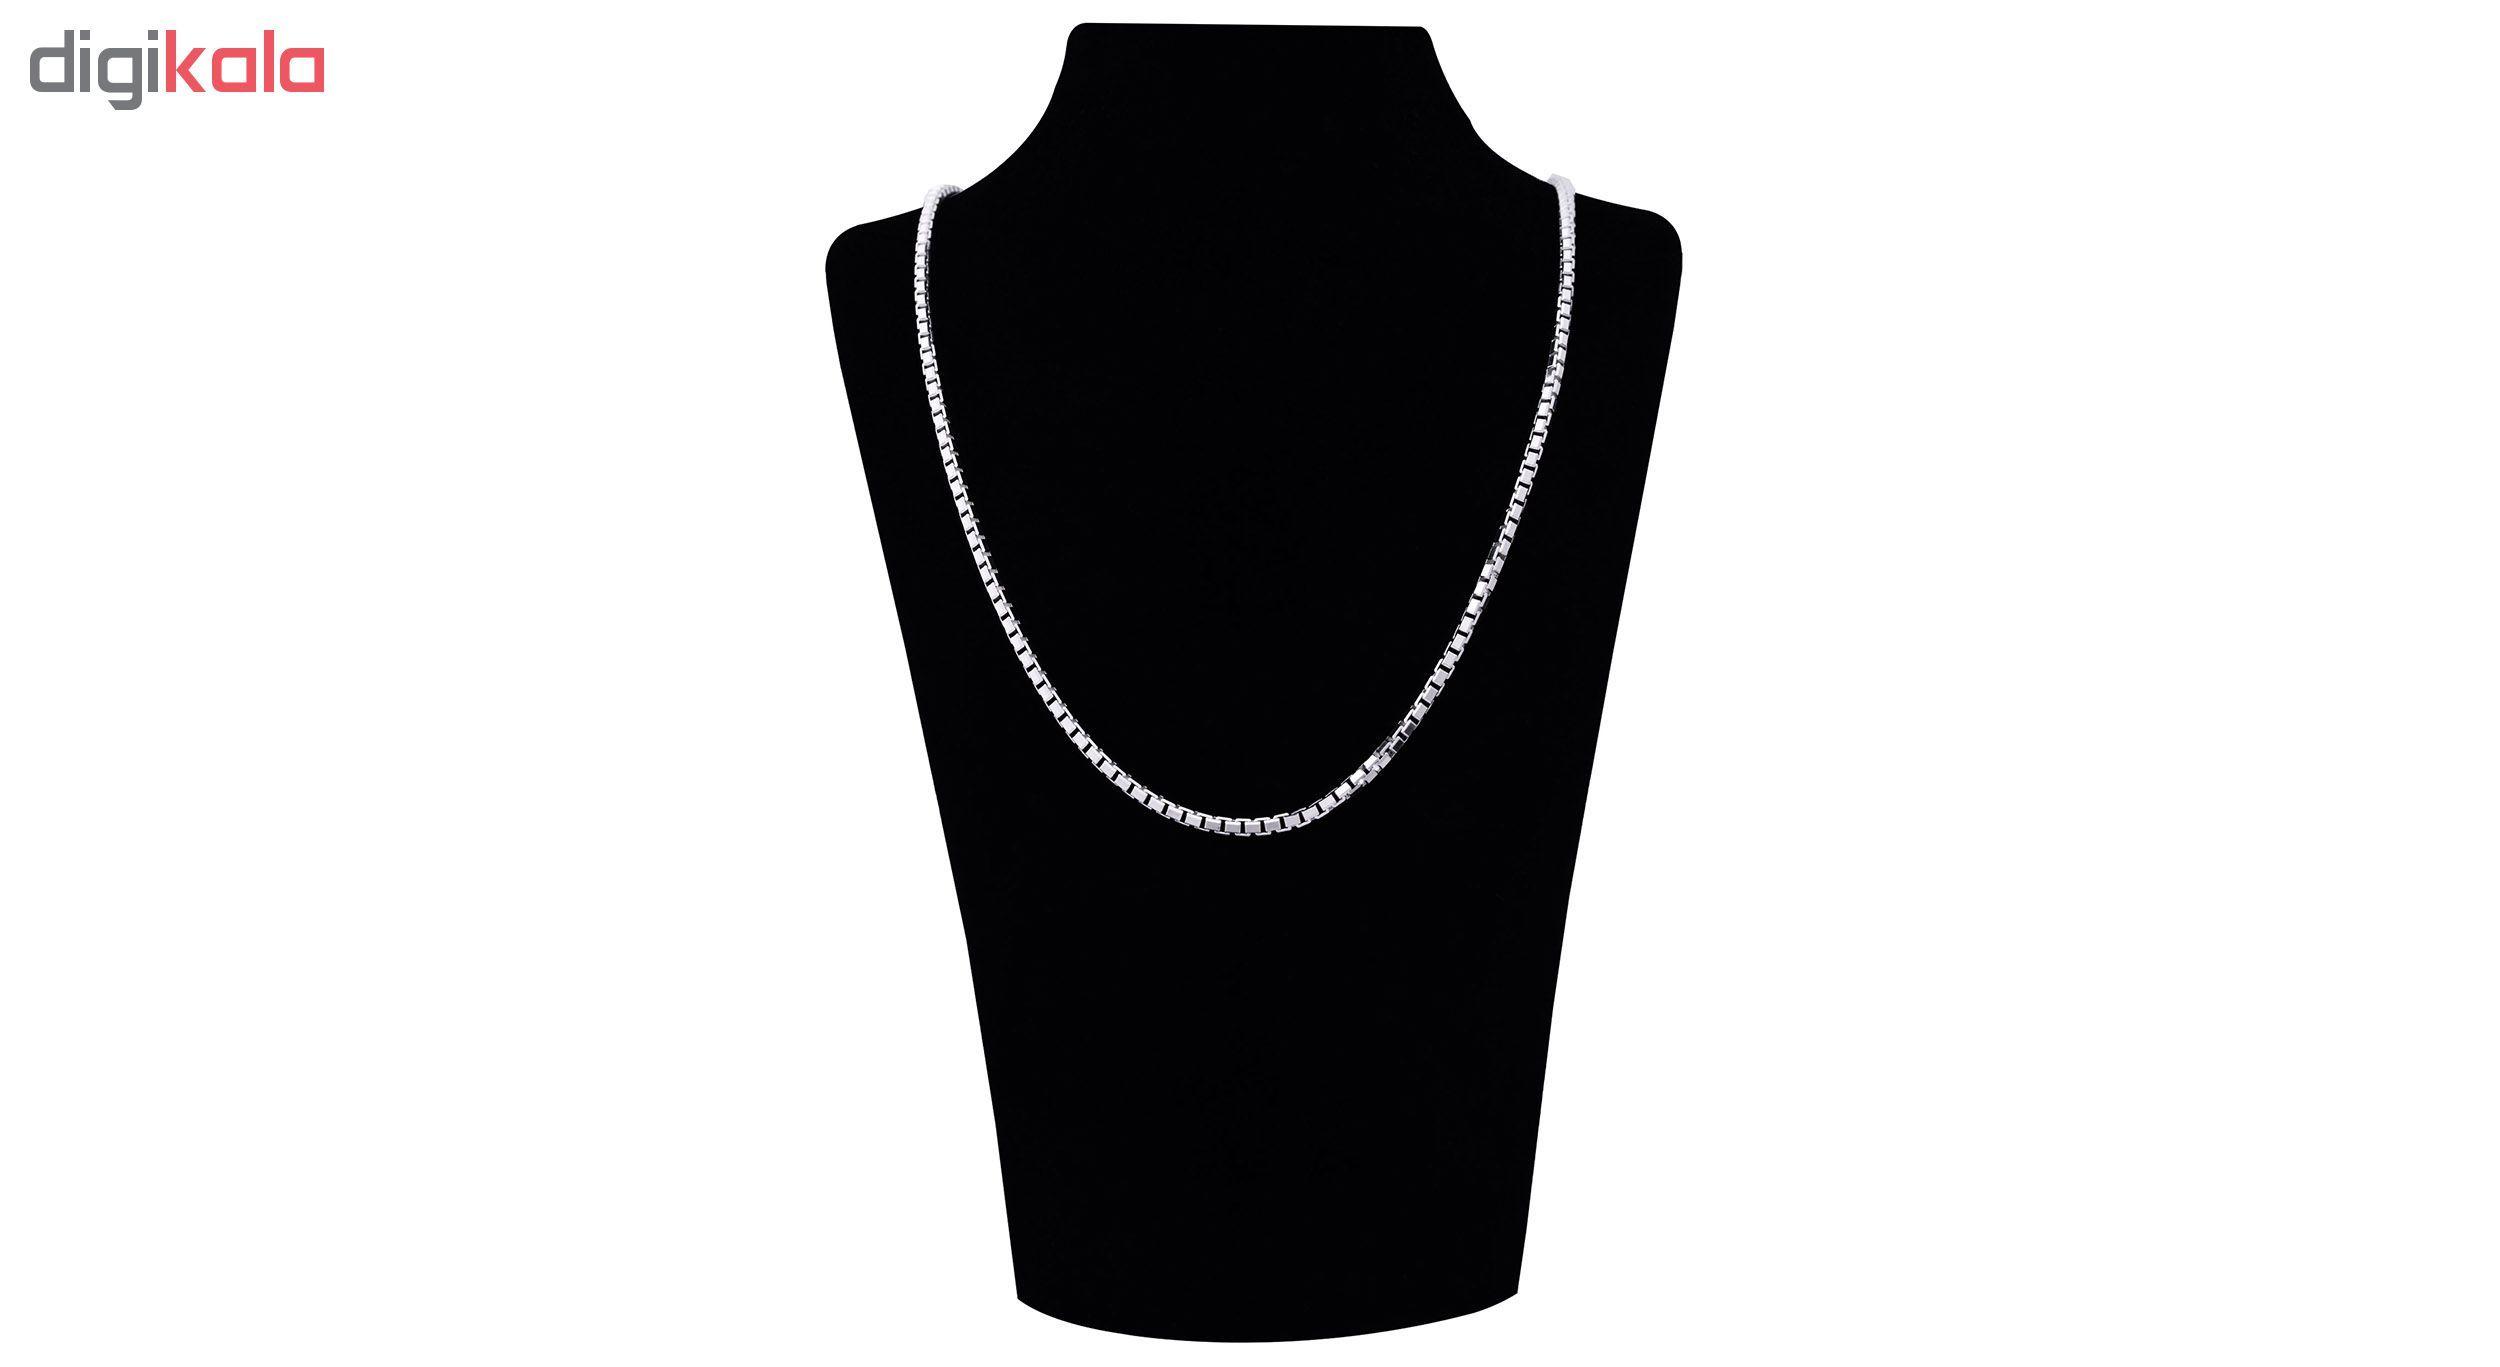 زنجیر نقره زنانه آرگو کد G-5